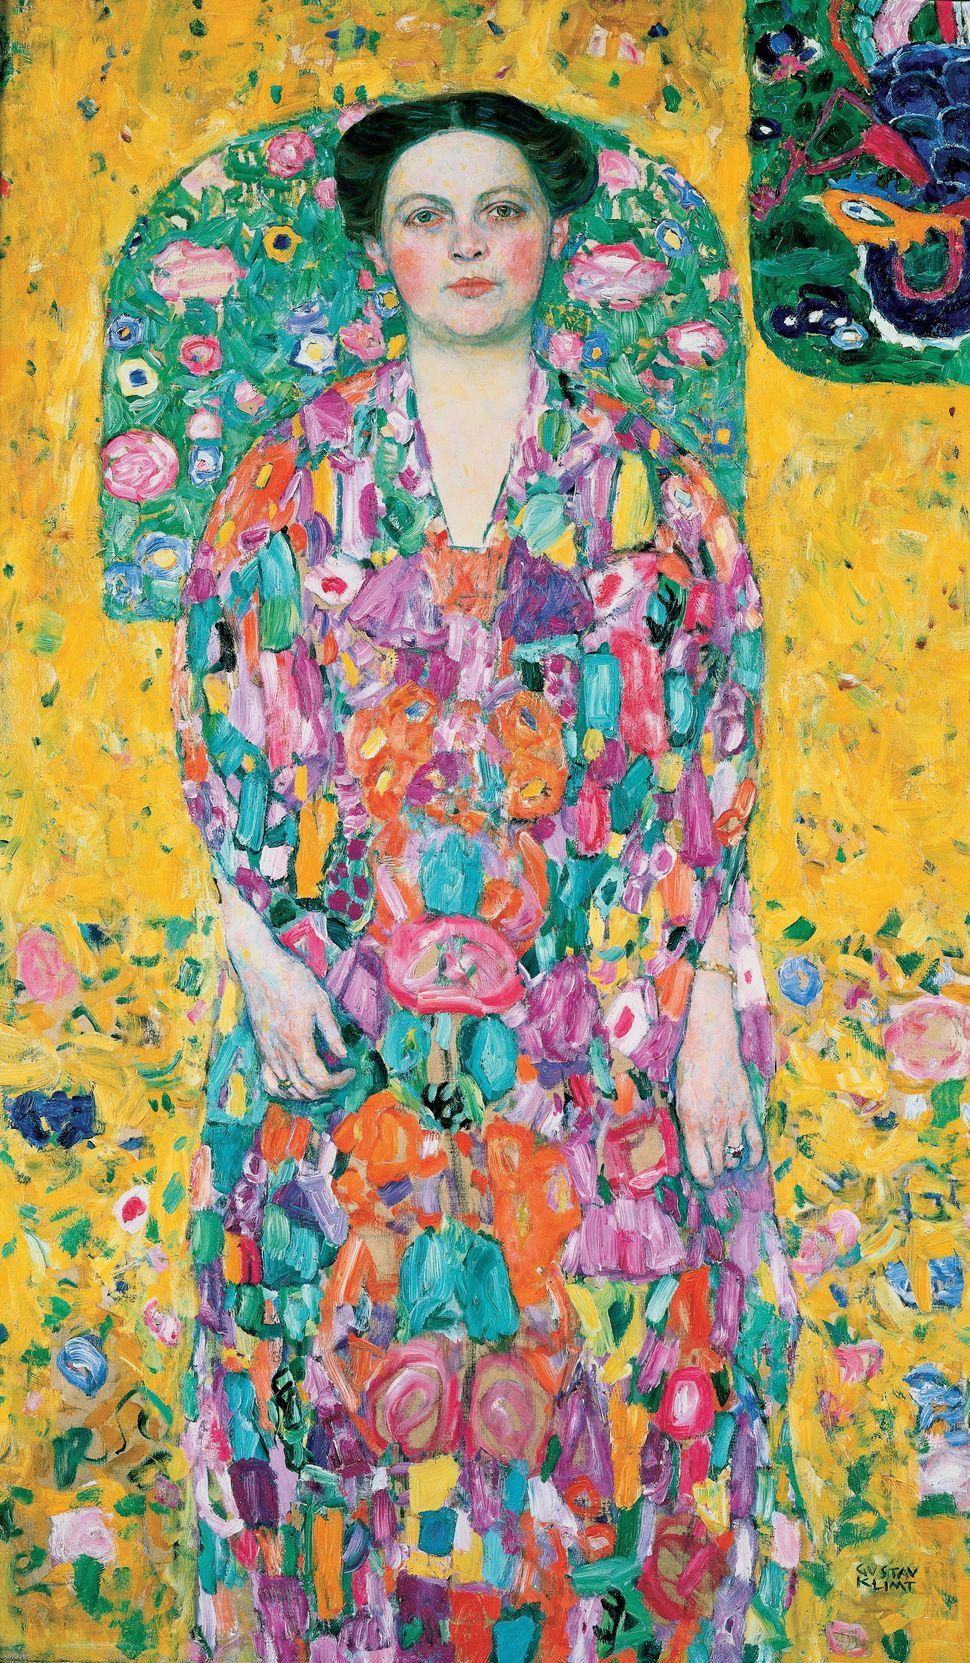 Eugenia Primavesi, painted by Gustav Klimt.